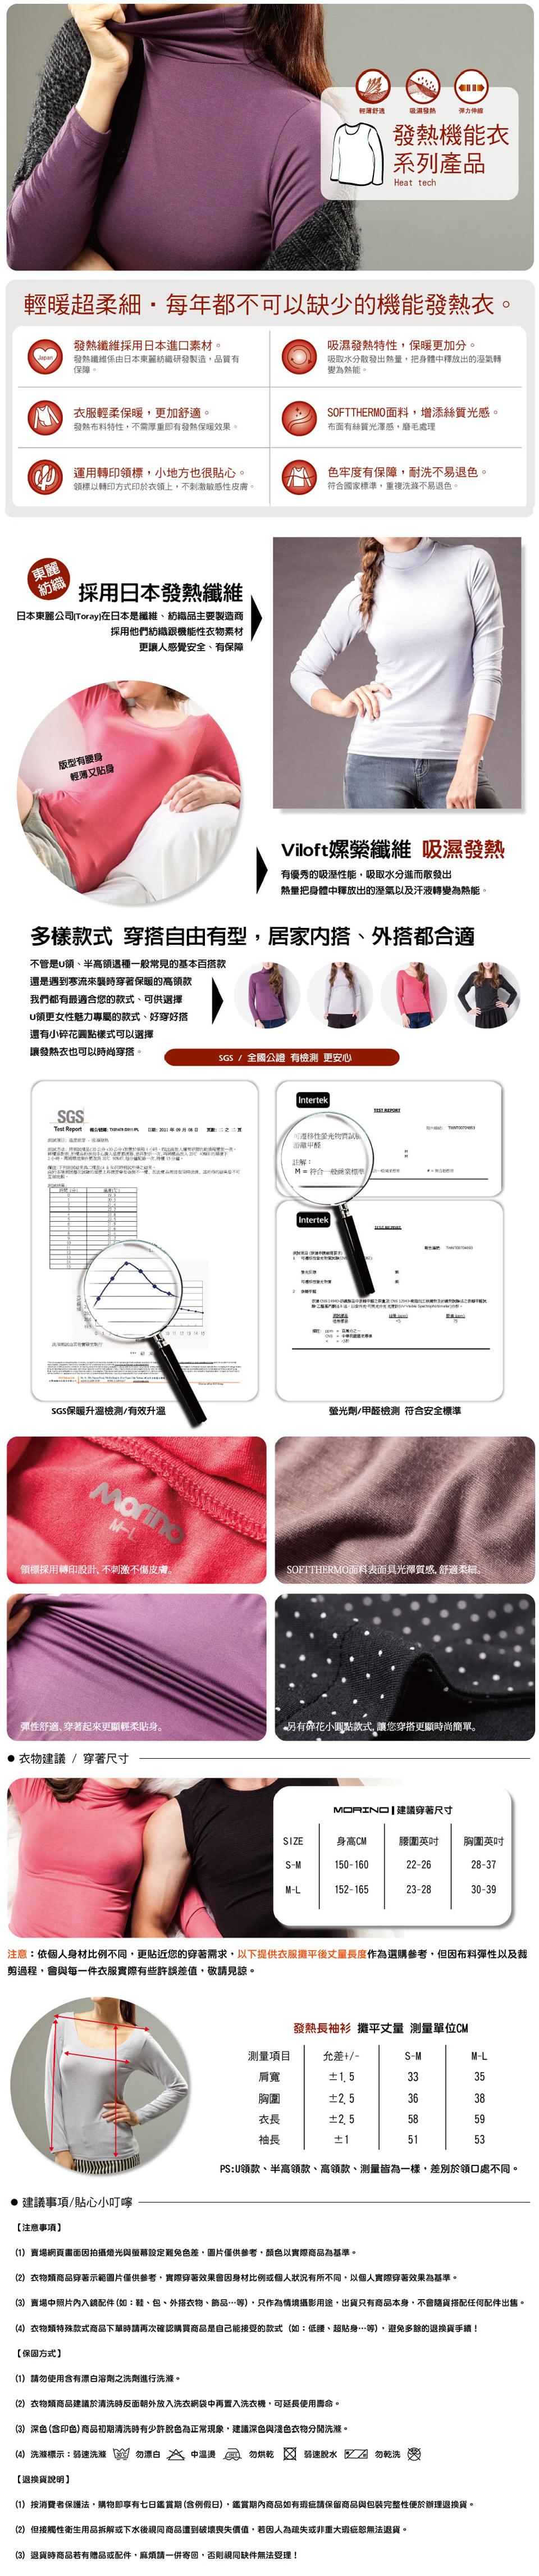 MO4210-11-12-20.jpg